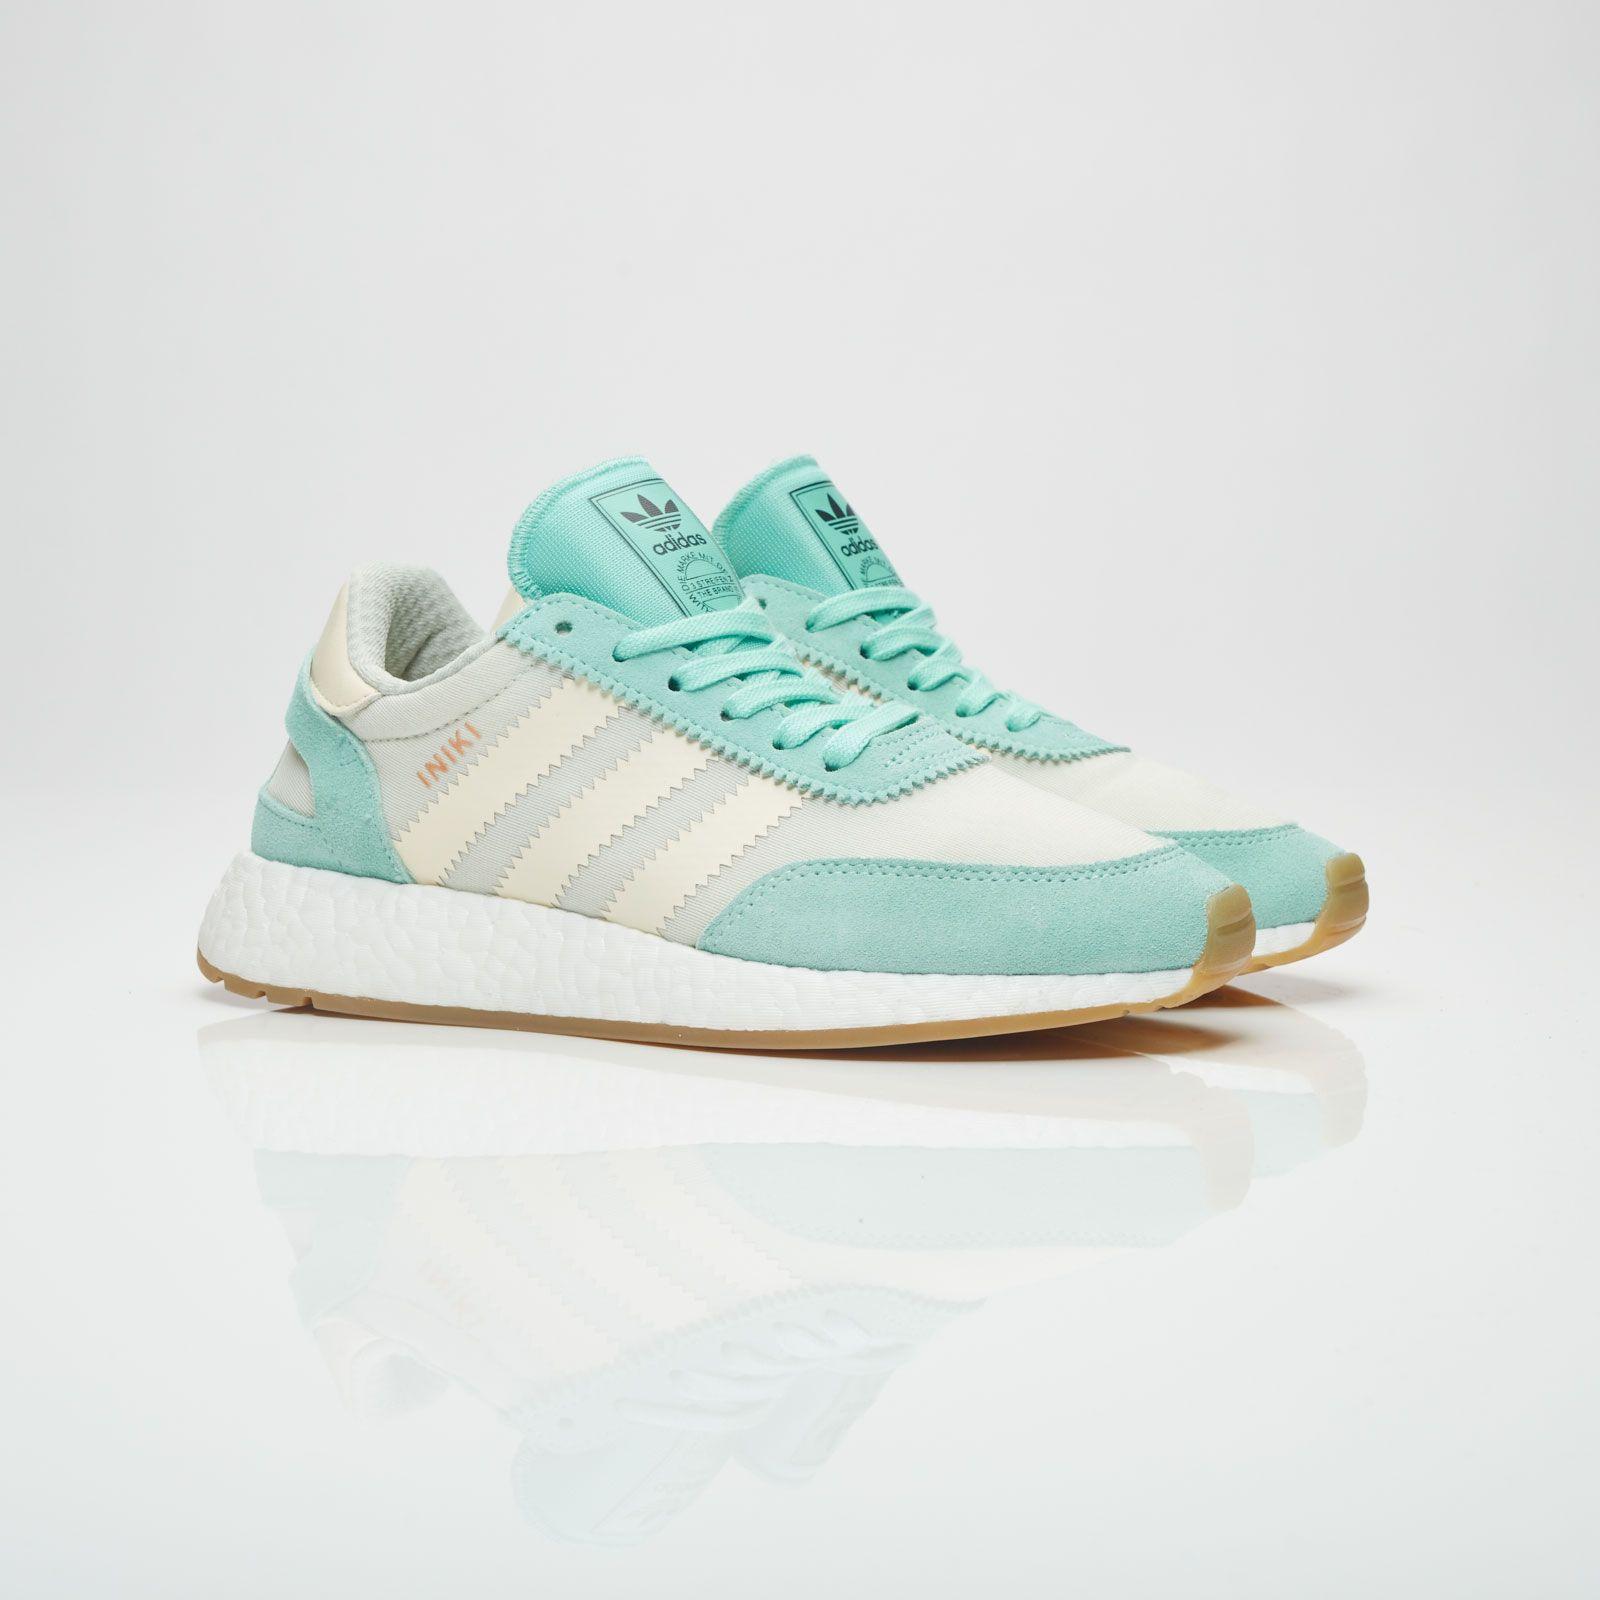 adidas iniki runner w ba9994 sneakersnstuff scarpe